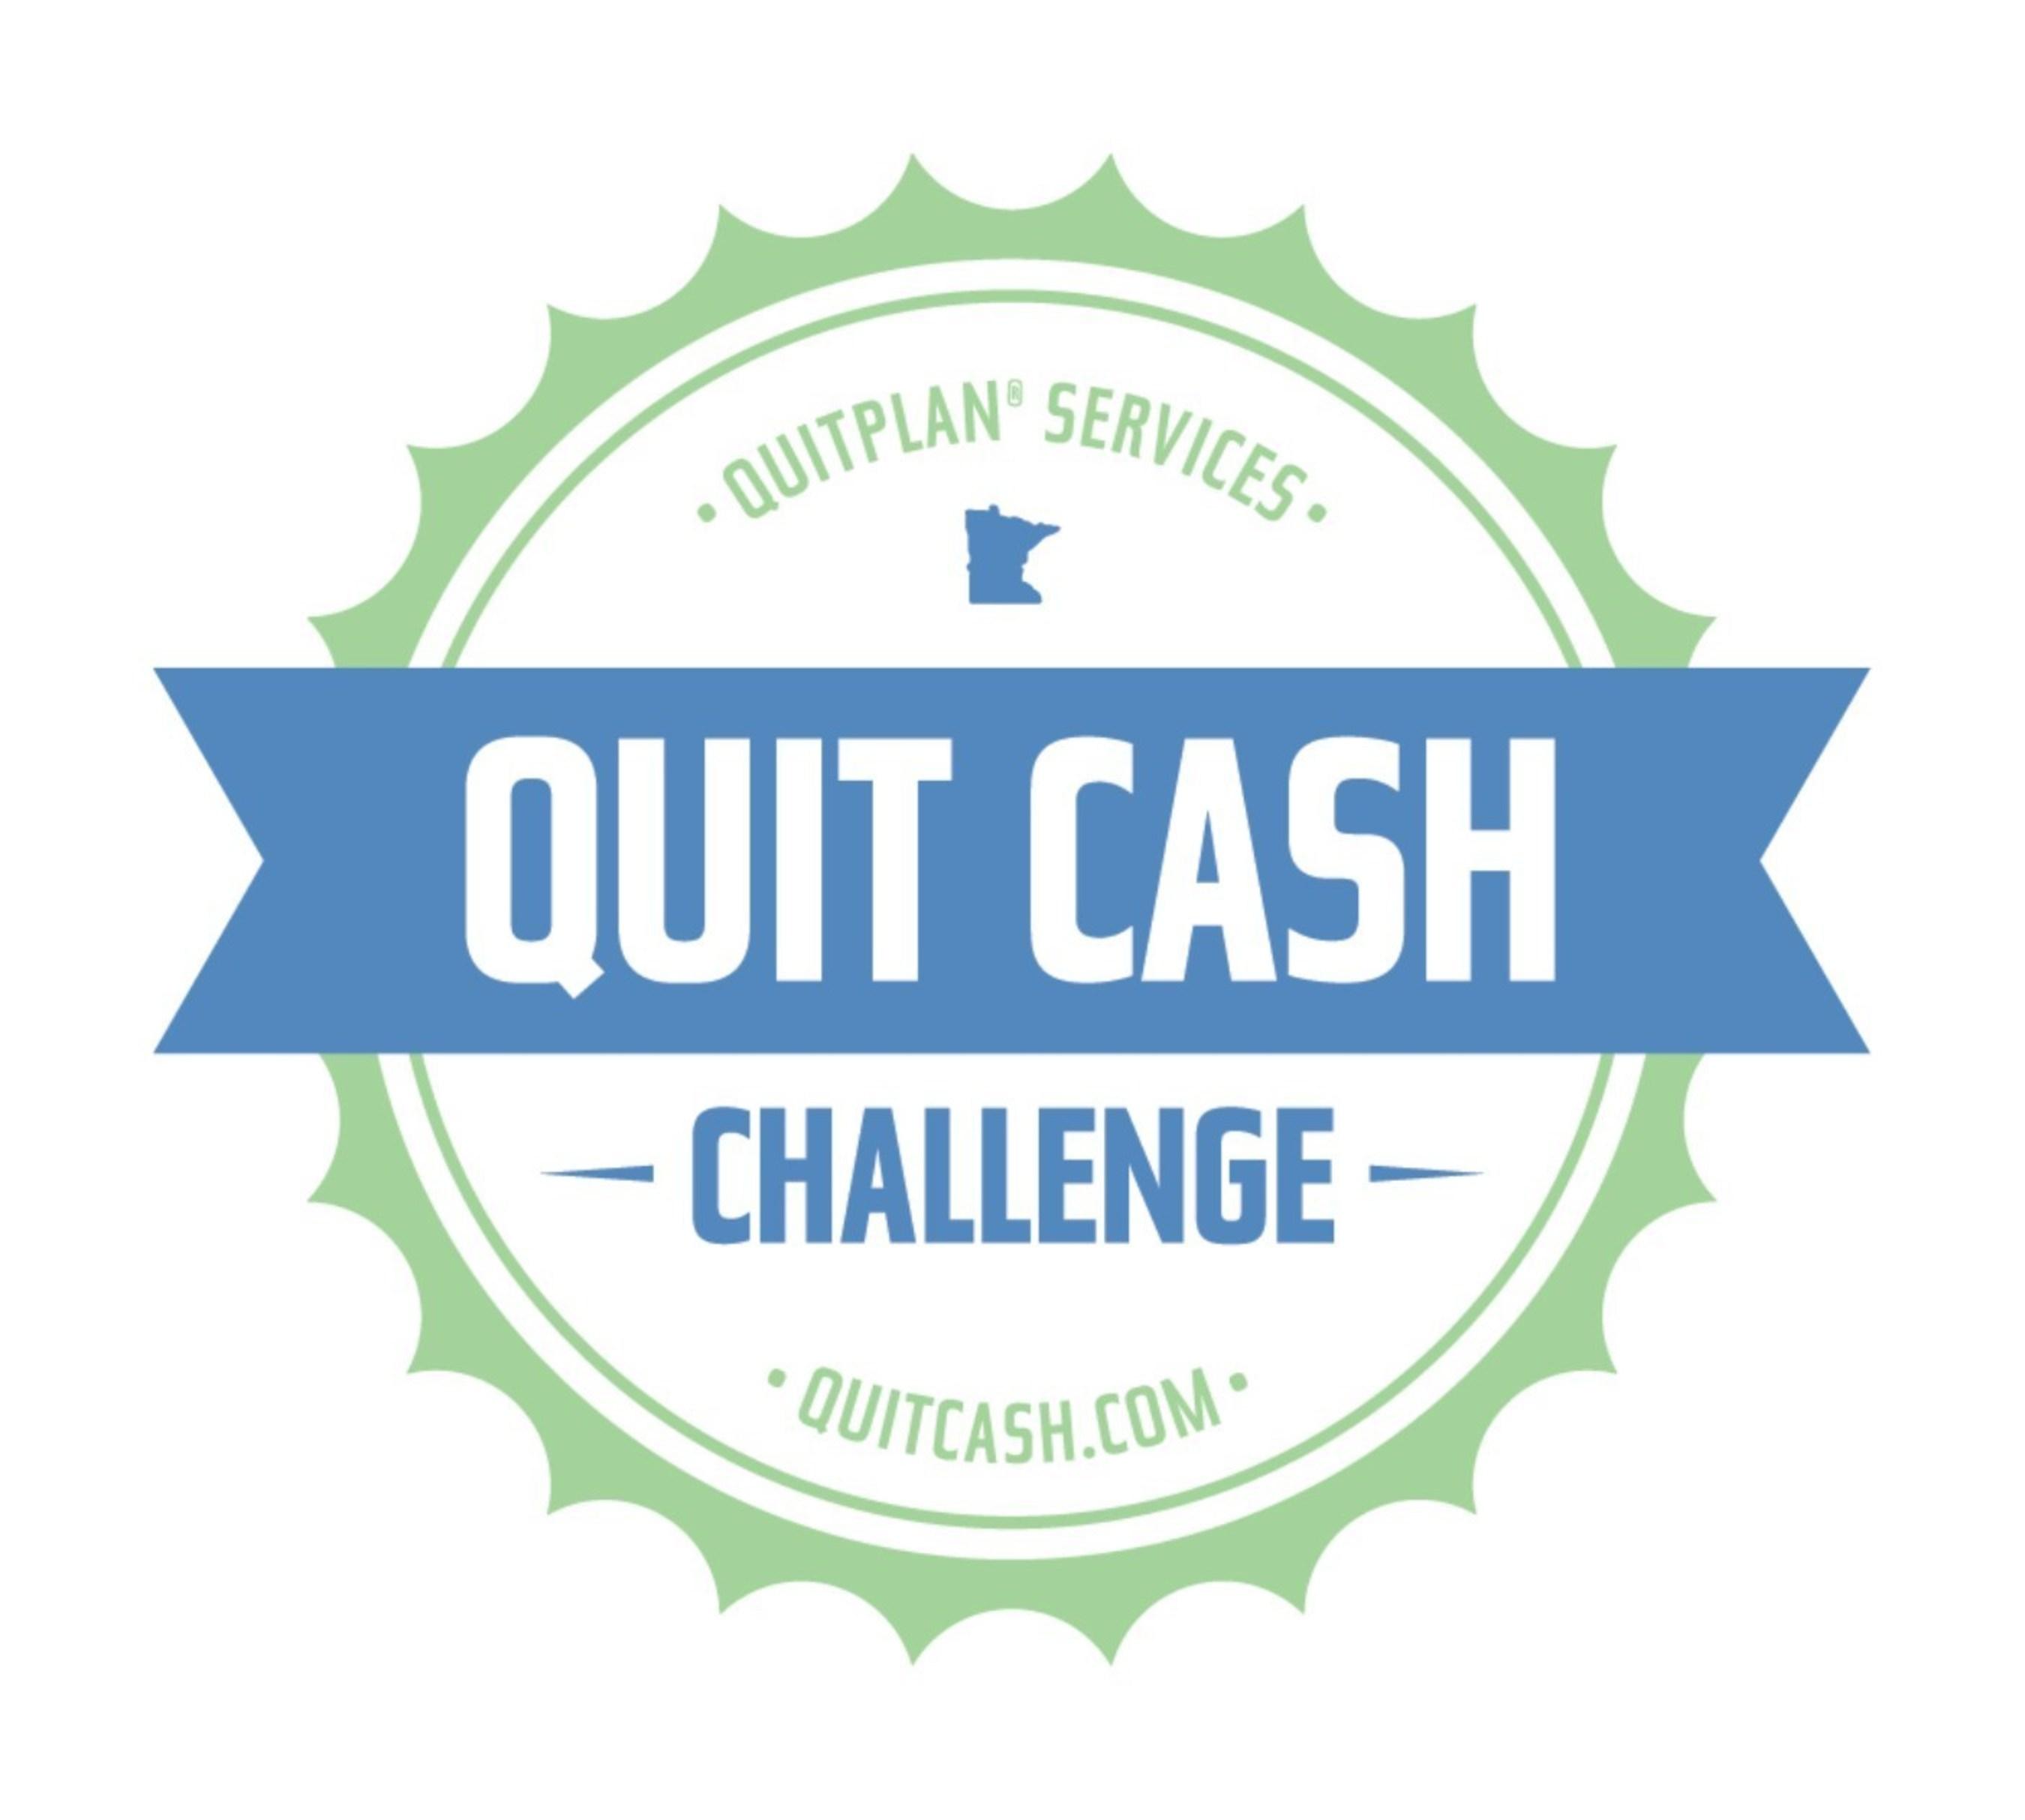 QUITPLAN(R) Services QuitCash Challenge(TM)